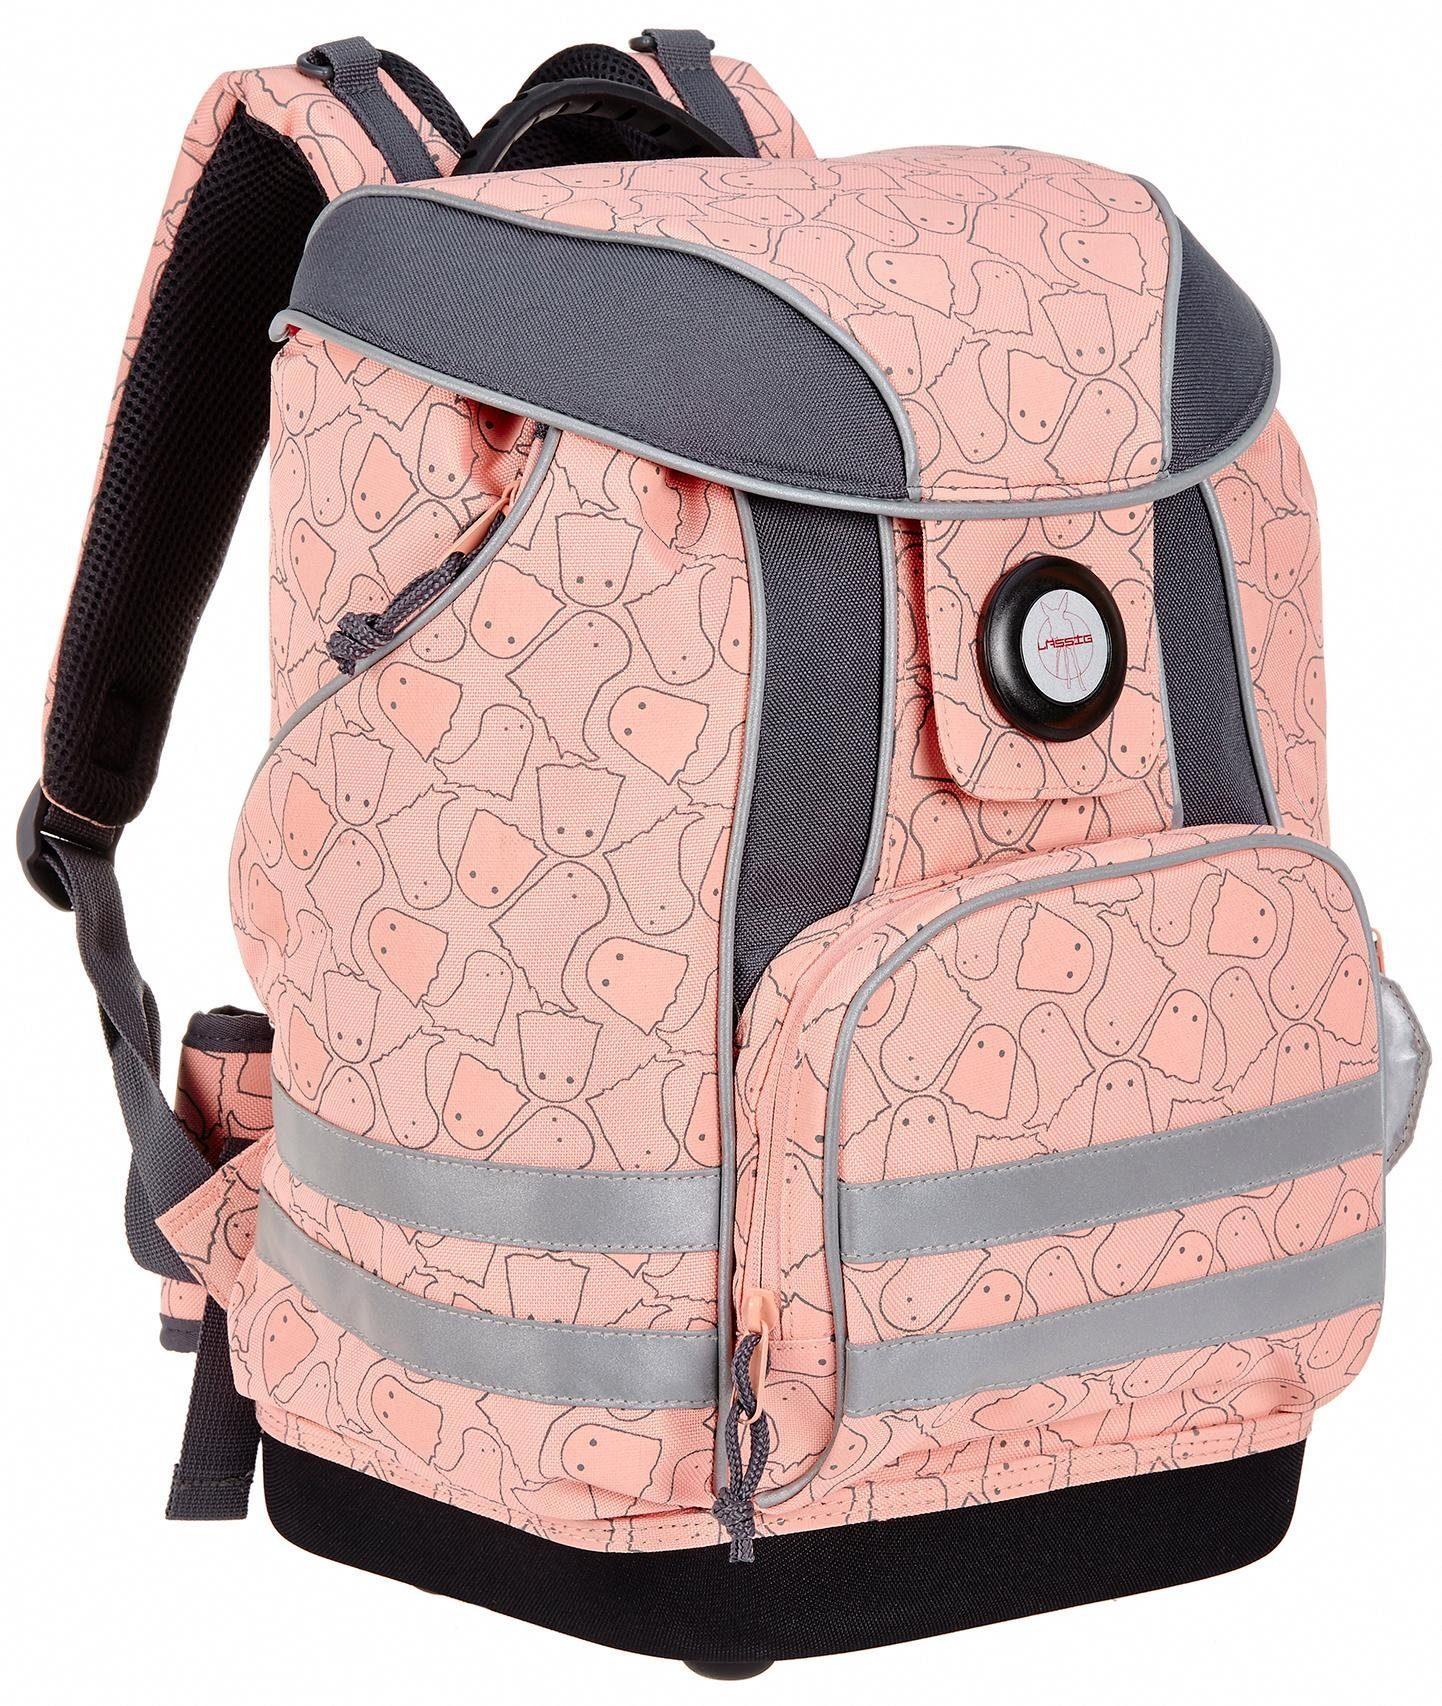 Lässig Schulrucksack, »4Kids School Bag, Spooky Peach«